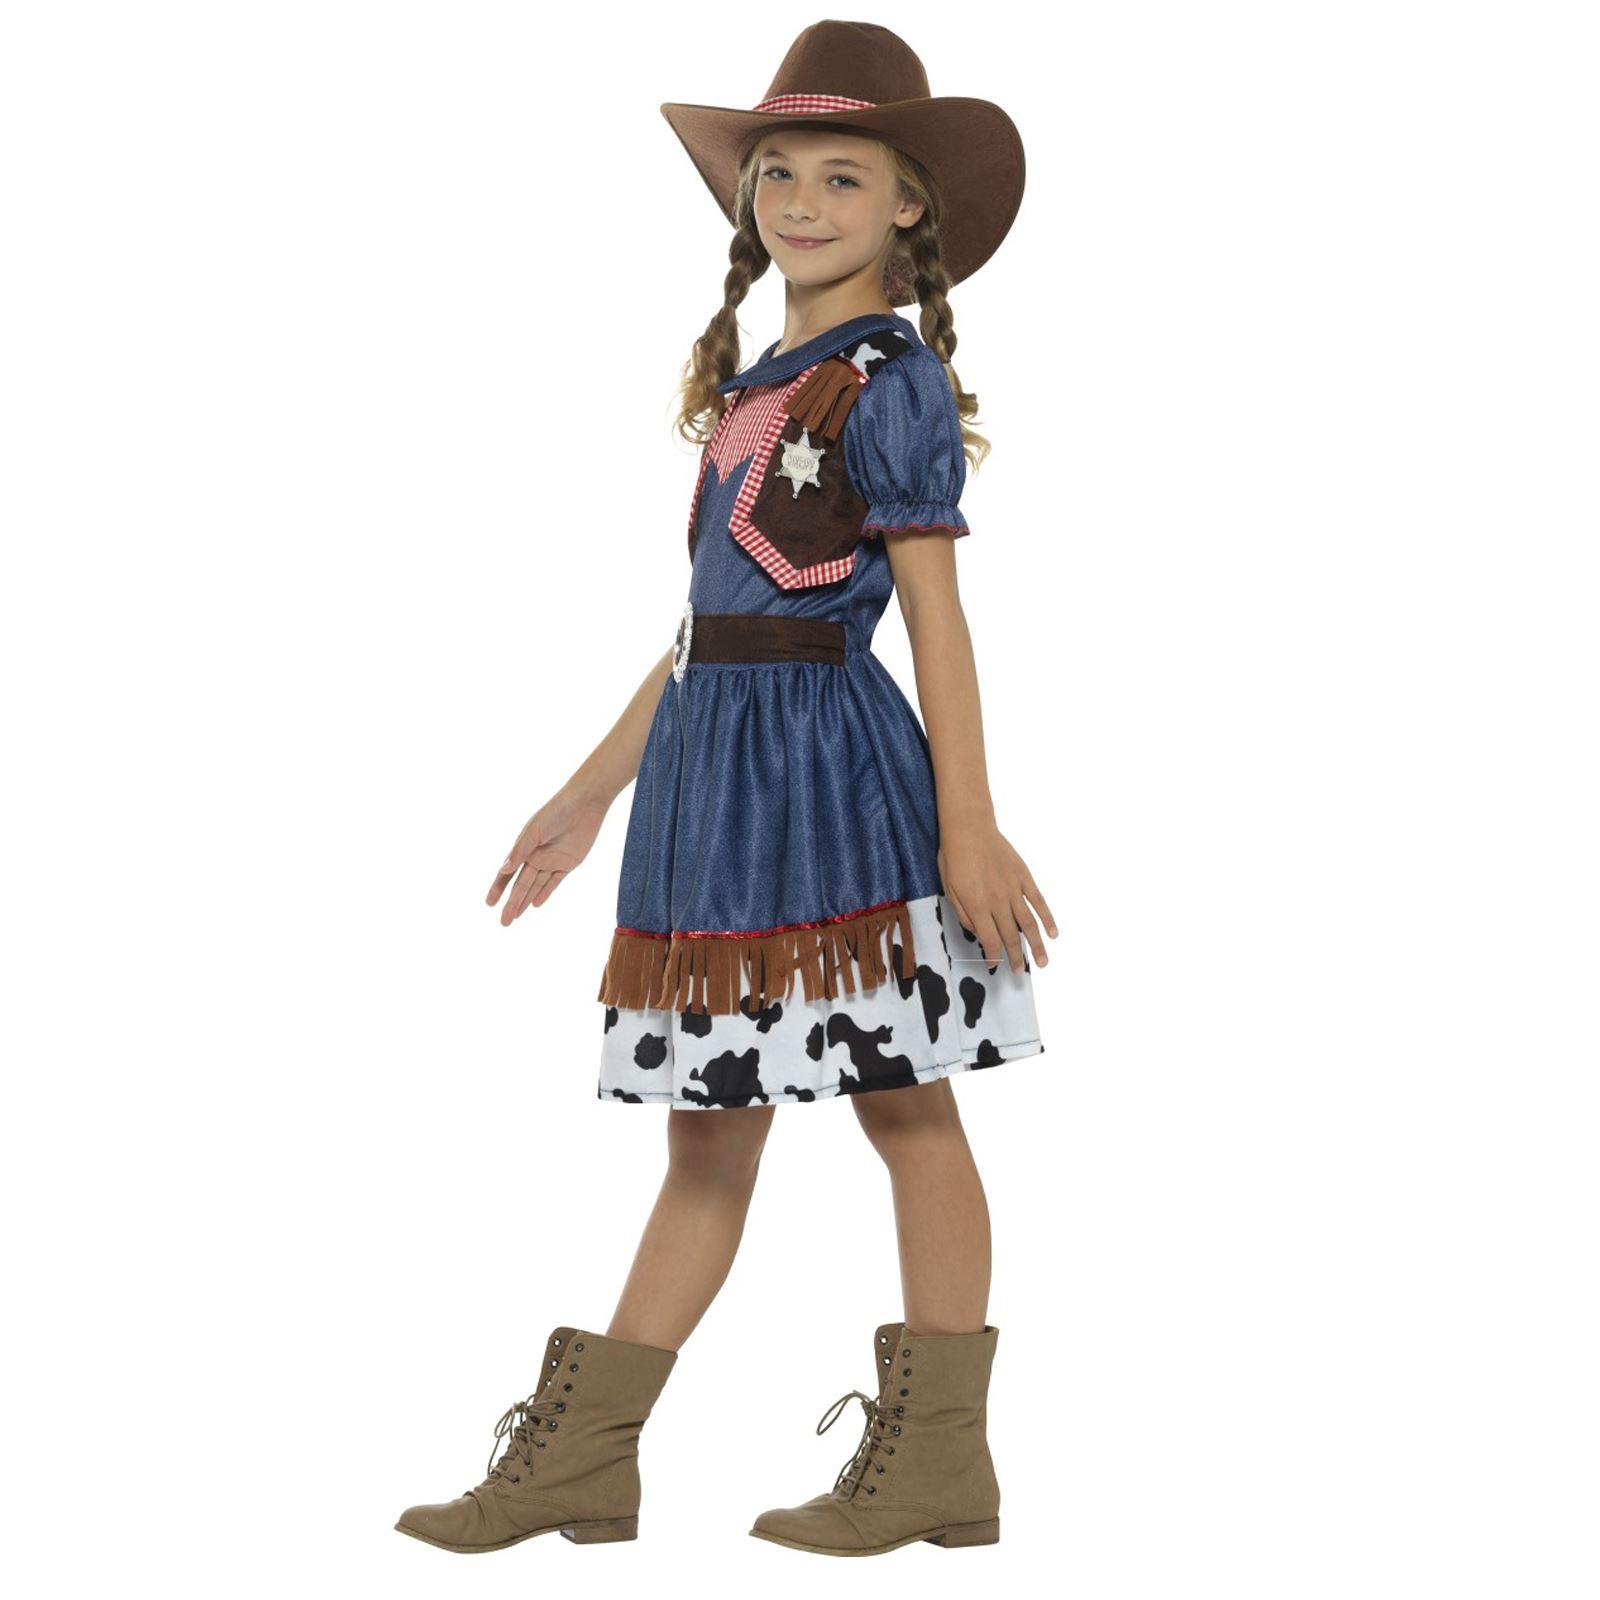 Girls Rodeo Cowgirl Costume  sc 1 st  eBay & Kids Girls Wild West Texan Rodeo Cowgirl Jessie Fancy Dress Book ...